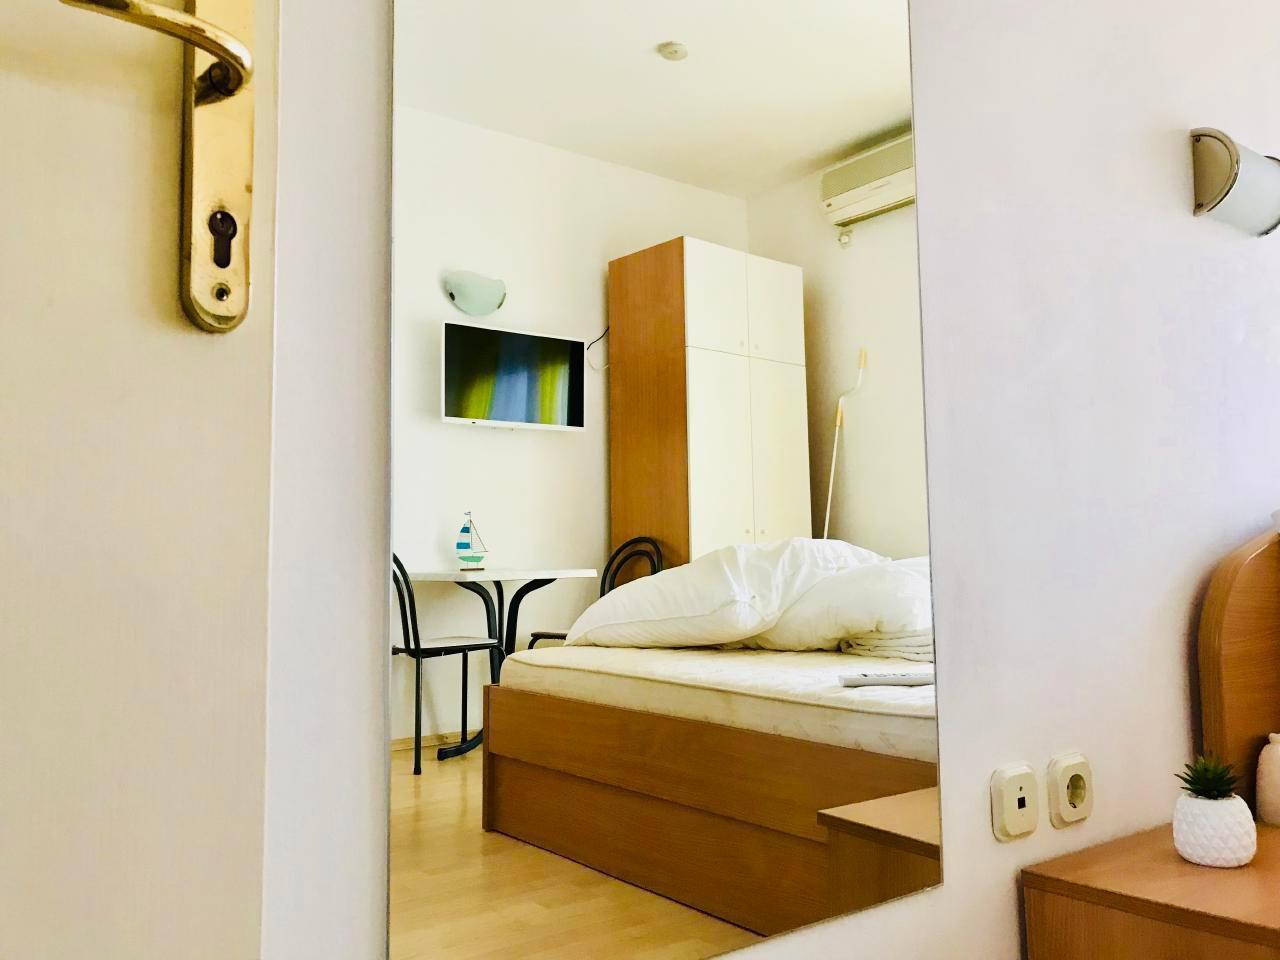 Ferienwohnung Apartmenthaus Ruza 4 - Studio (98392), Kaštel Štafilić, , Dalmatien, Kroatien, Bild 3